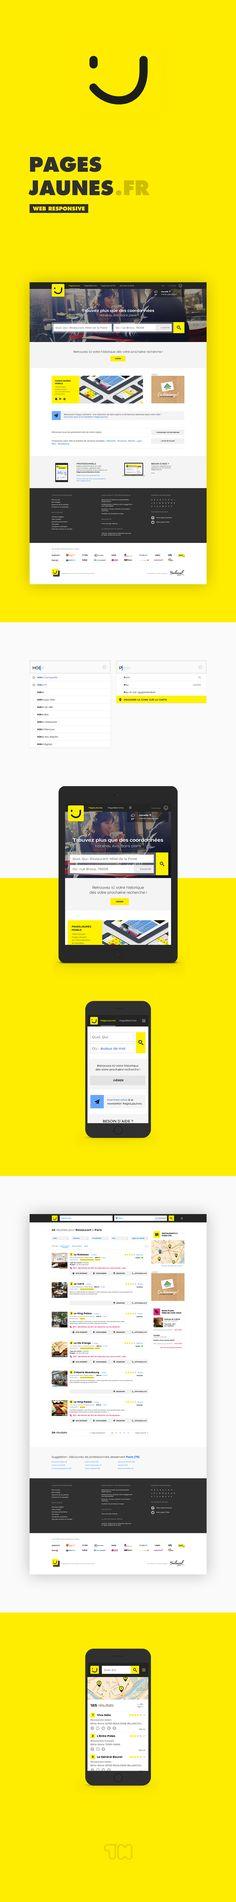 Découvrez mon projet @Behance: «PagesJaunes.fr» https://www.behance.net/gallery/41013559/PagesJaunesfr  UI Design / Redesign website Yellow Pages France